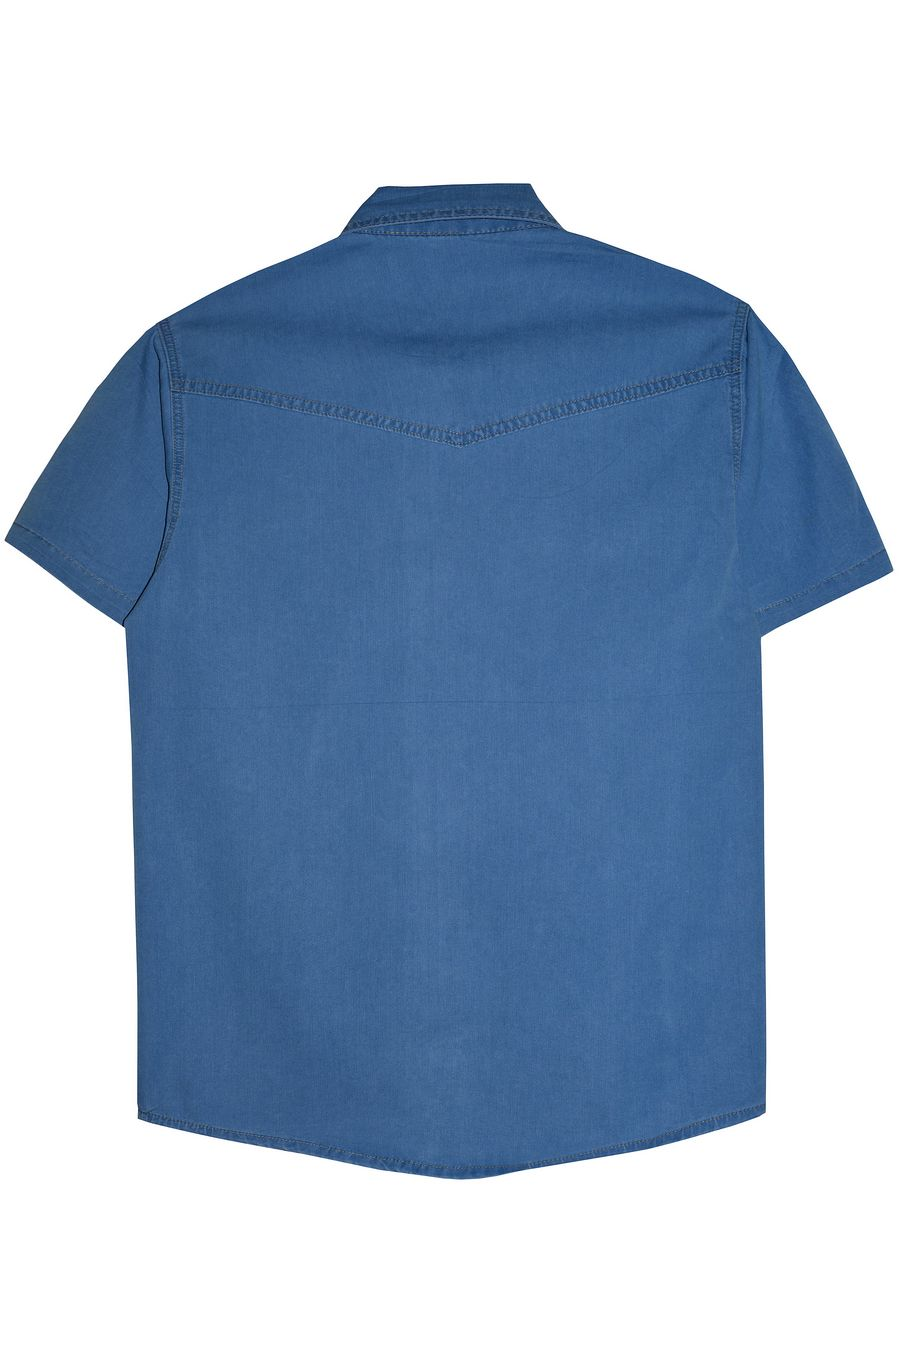 Рубашка мужская Vicucs 728E/CT-321-20 (XL-5XL) - фото 2